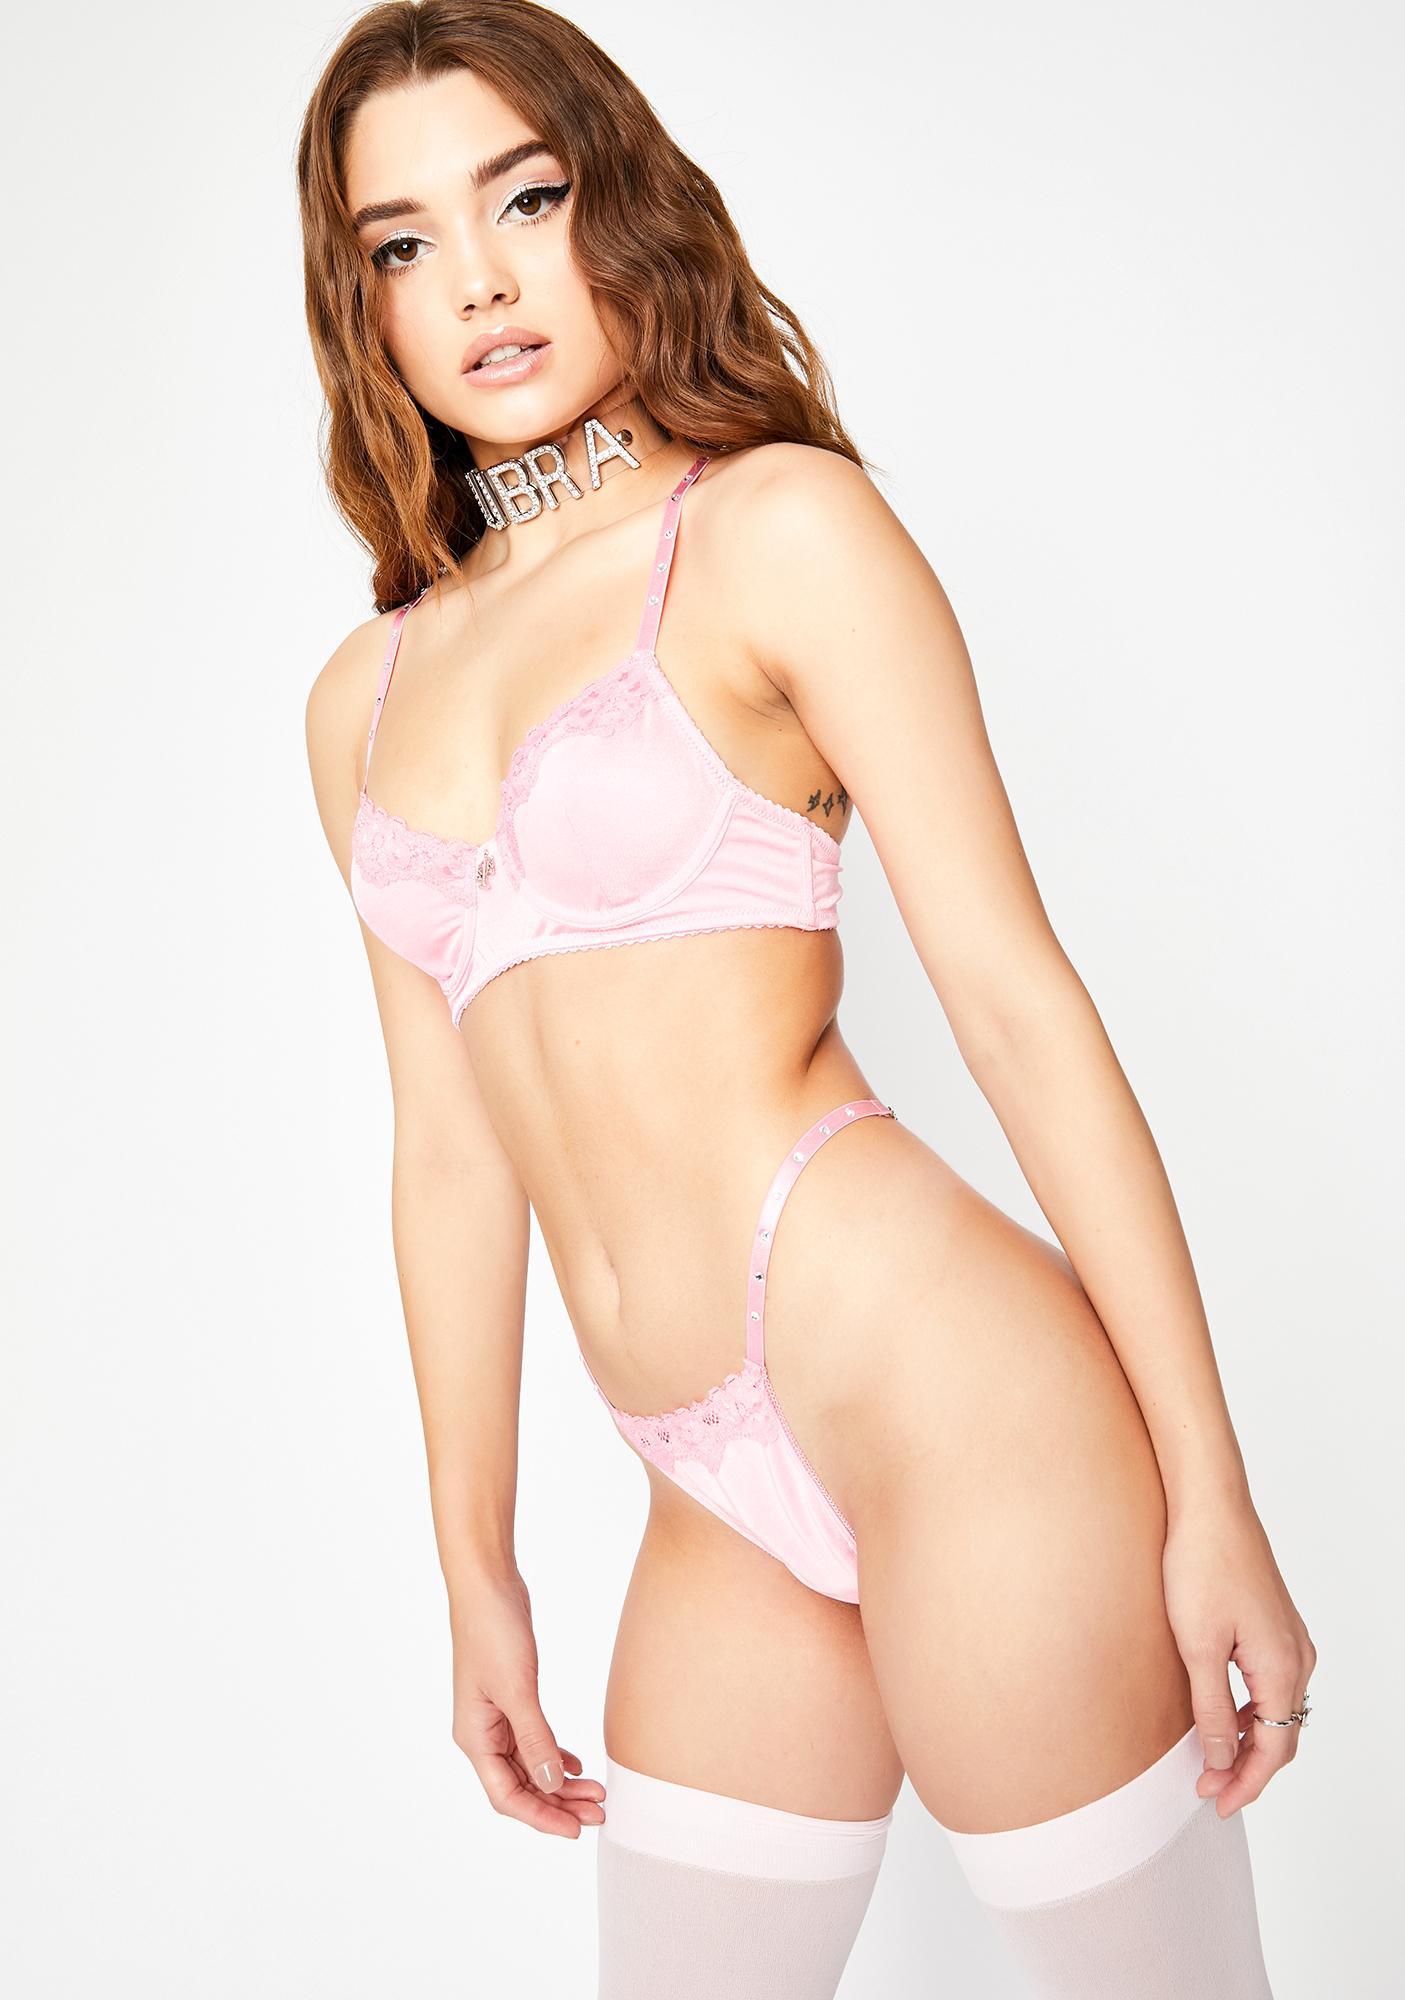 HOROSCOPEZ Lust For Libra Thong Panties